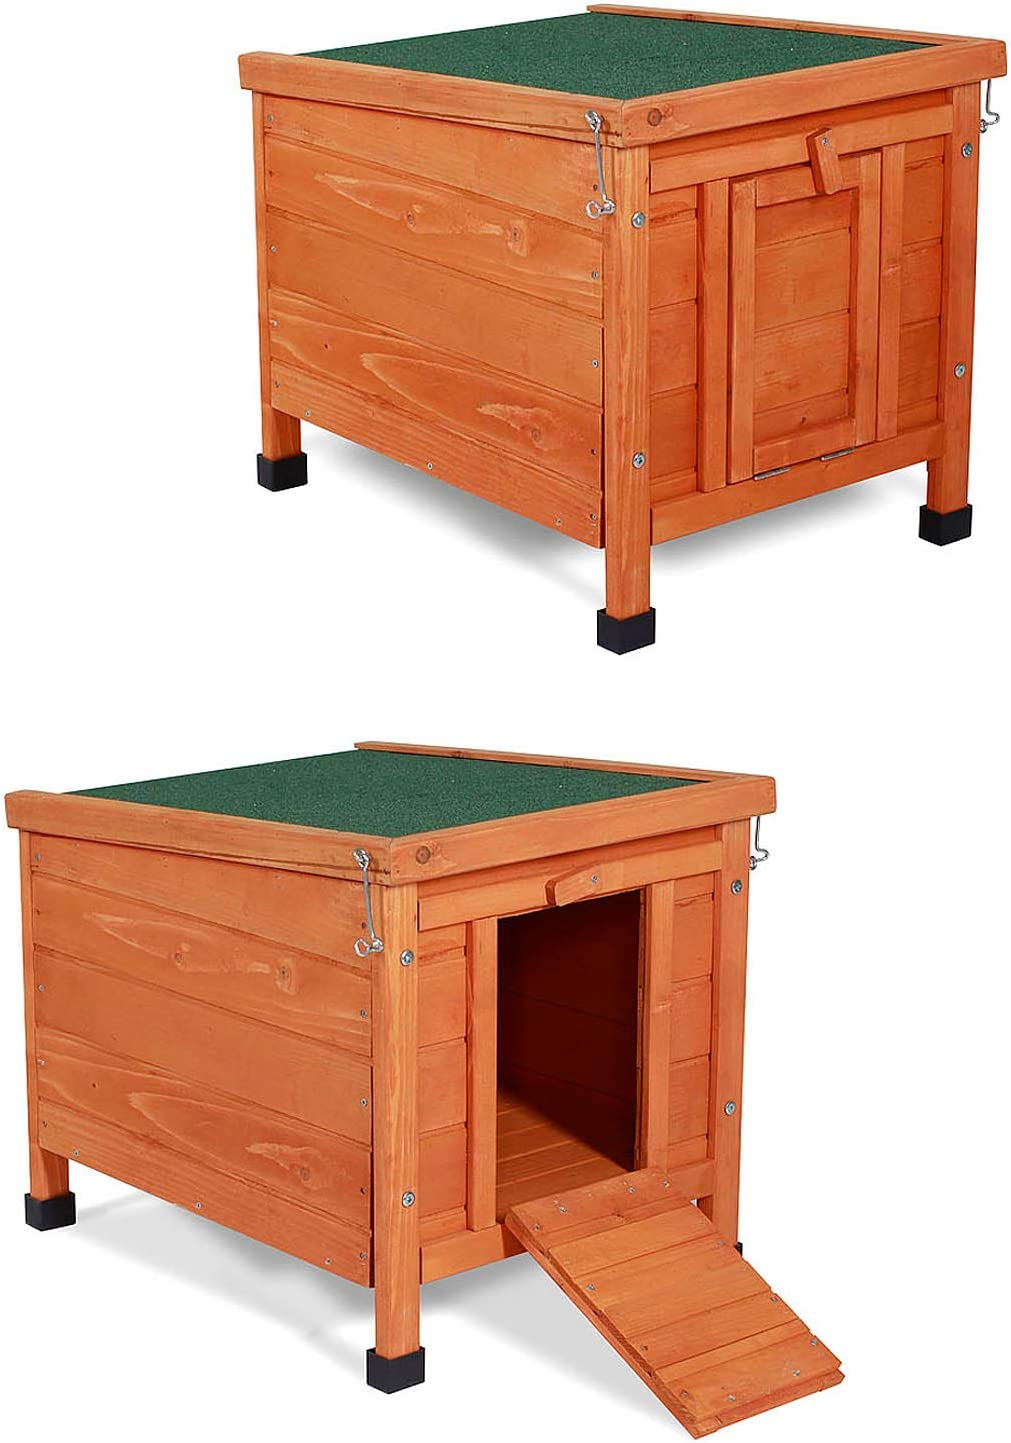 Dibea Conejera de Madera caseta Exterior para Mascotas pequeñas cobertizo 43x43x52 cm